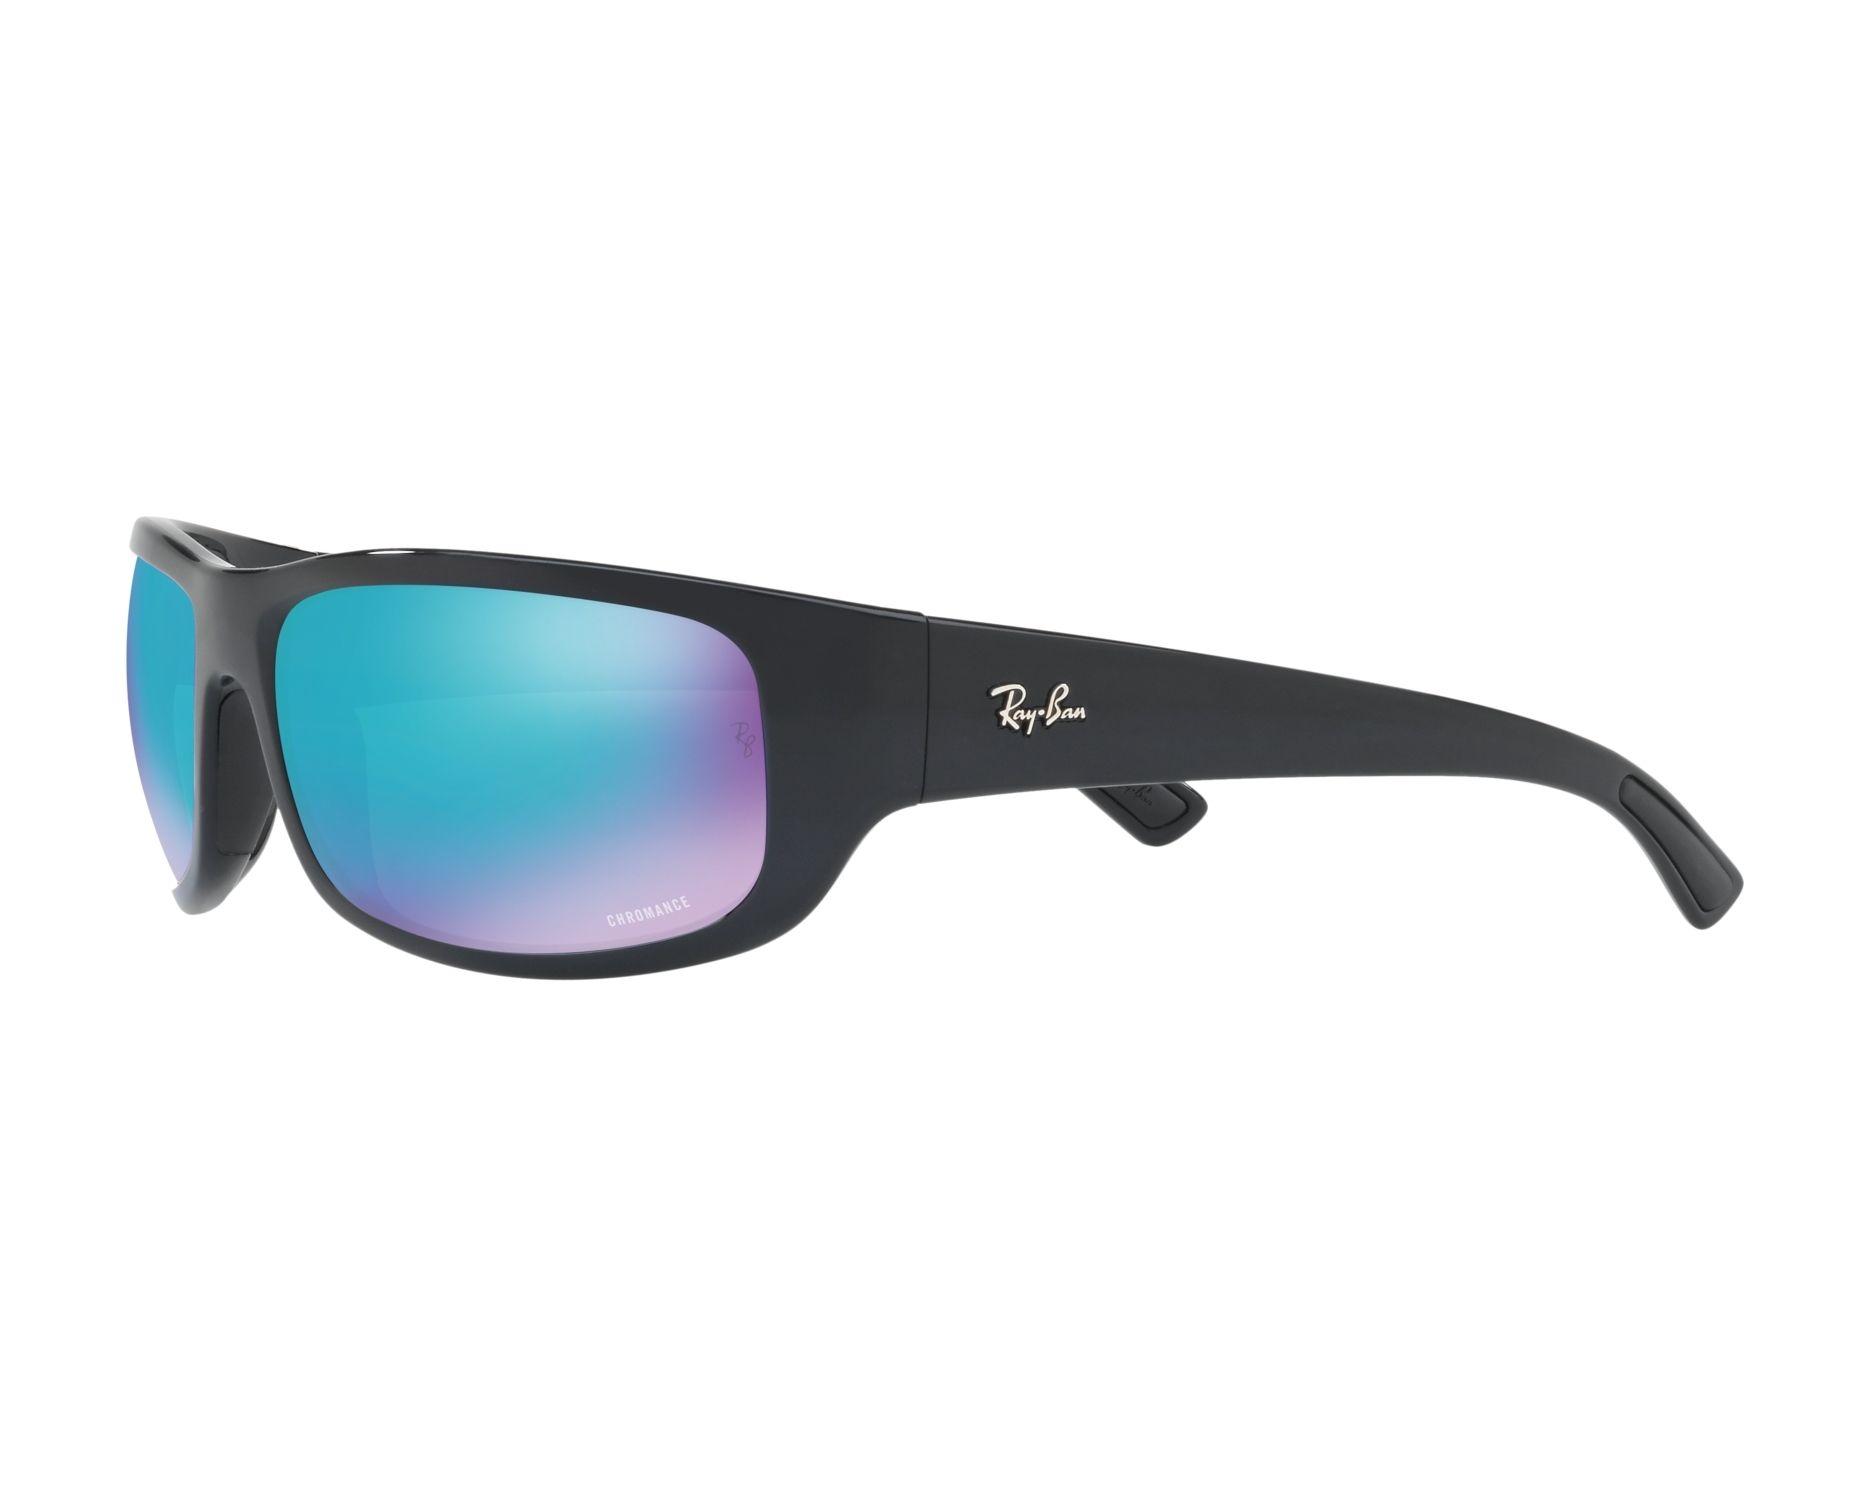 c791ec9337 Sunglasses Ray-Ban RB-4283-CH 601 A1 64-18 Black